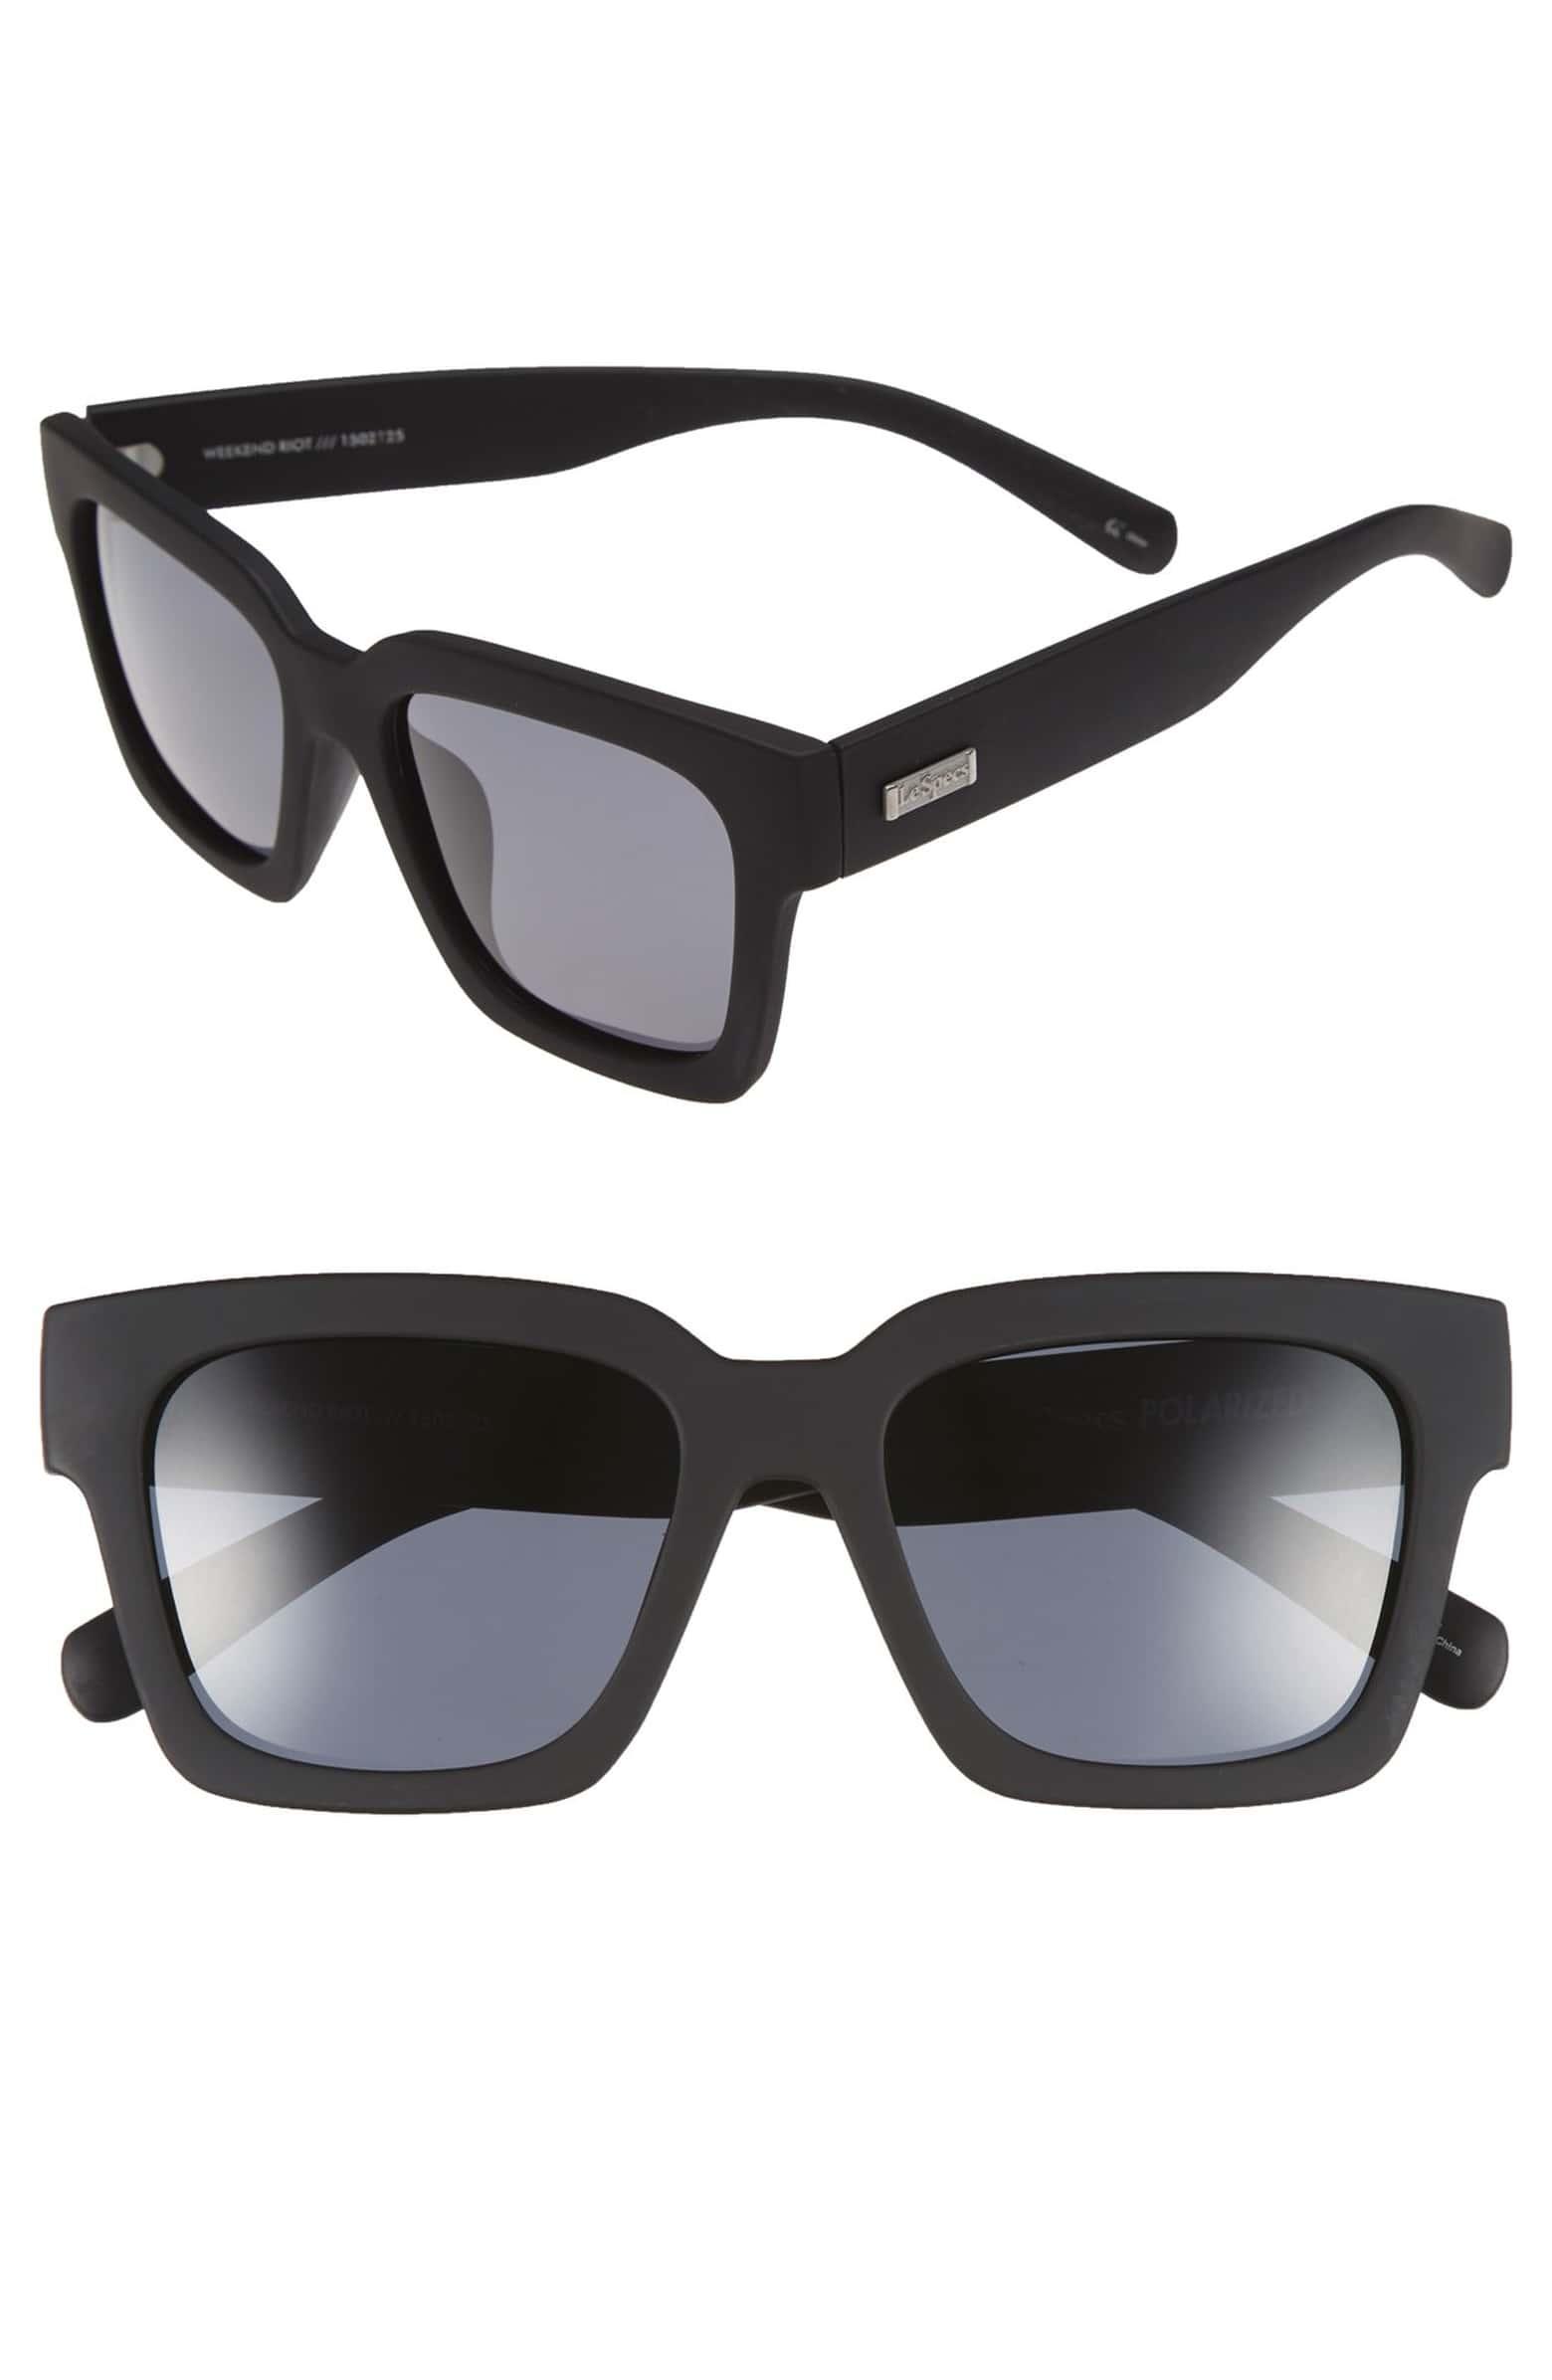 sunglassers